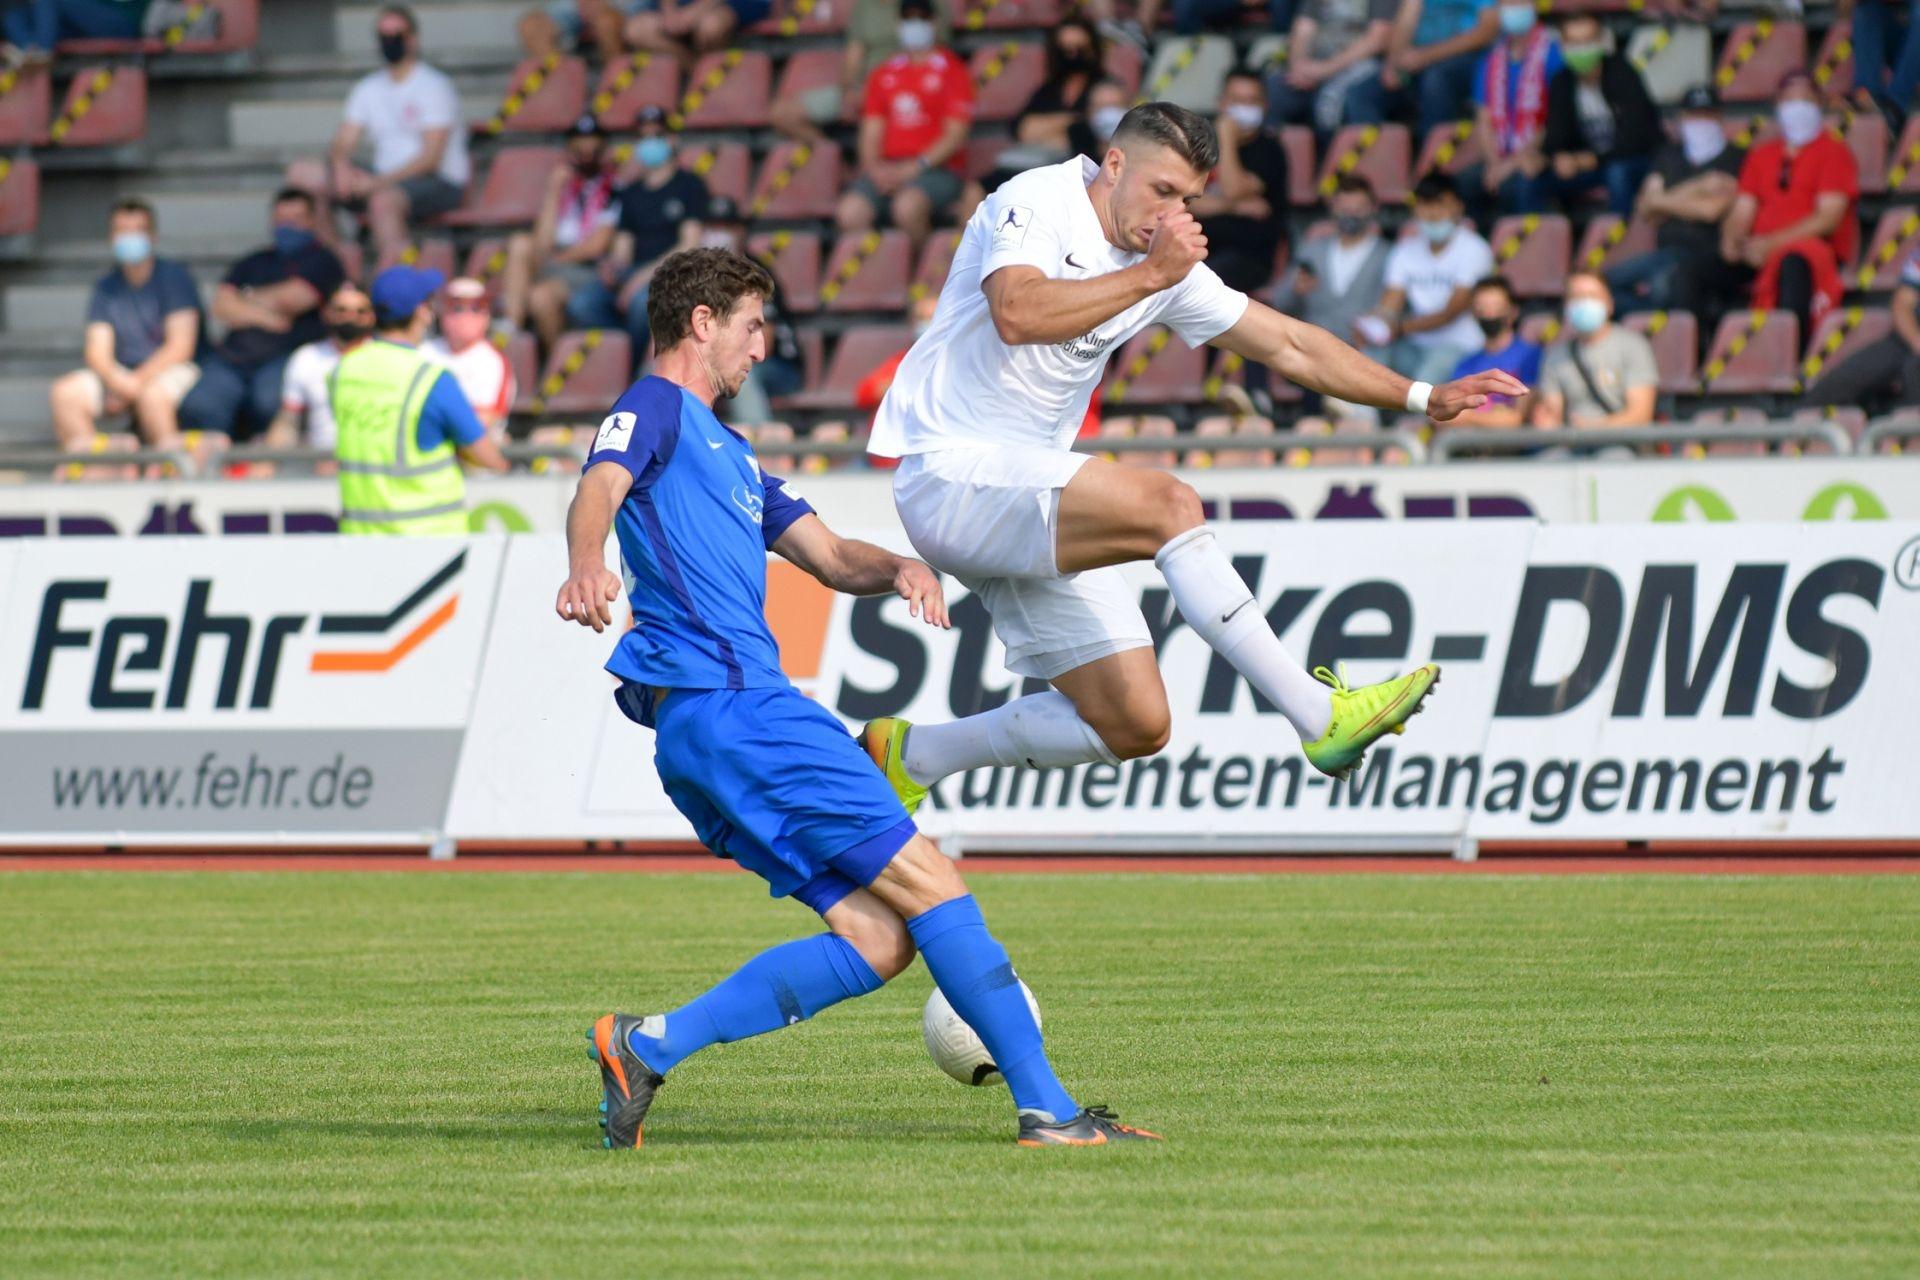 Regionalliga S�dwest 2020/21, KSV Hessen Kassel, TSV Schott Mainz, Endstand 2:1